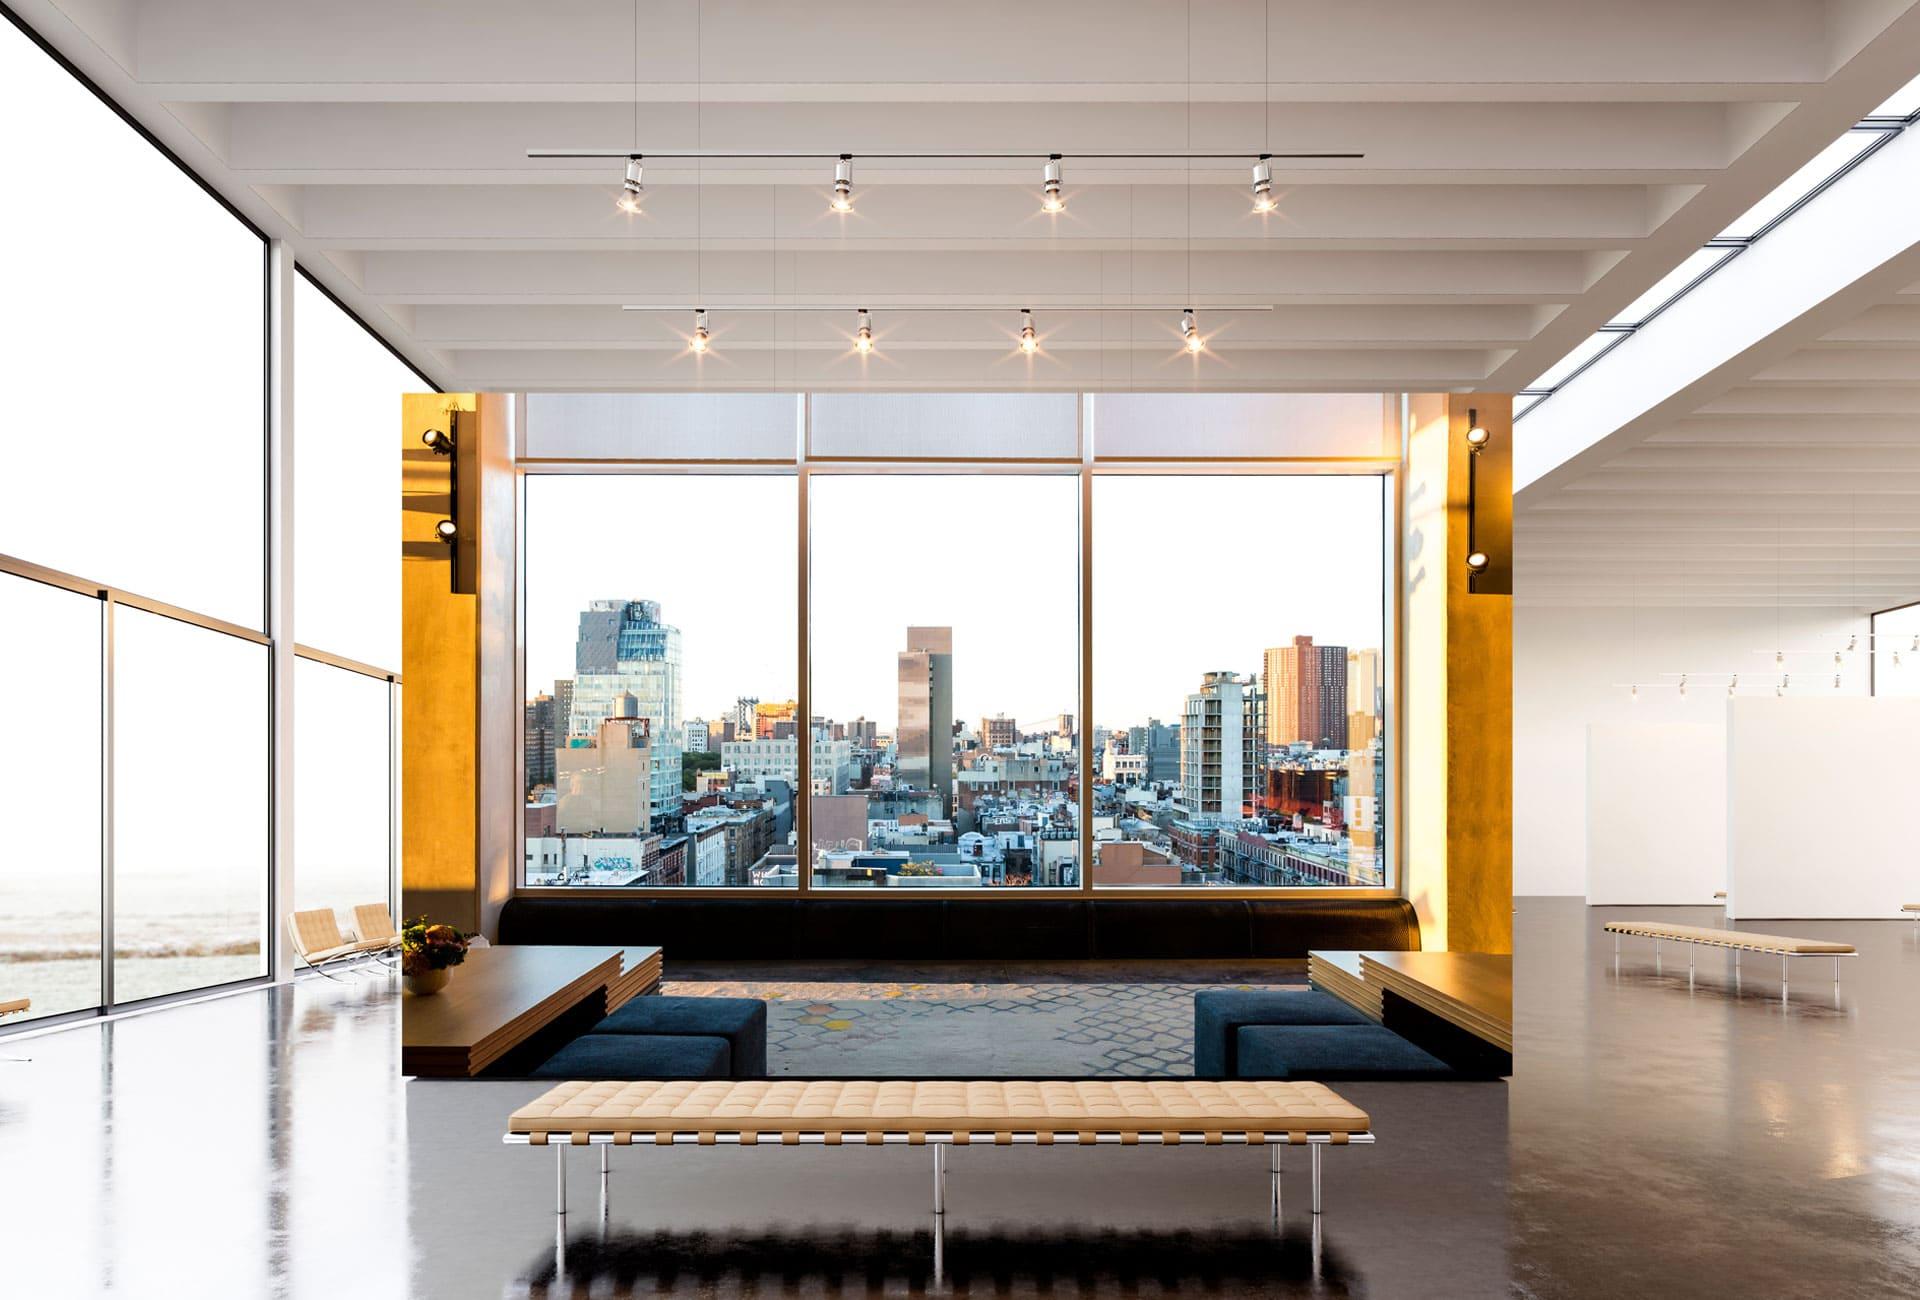 simoarts-com-simone-kessler-fotokunst-nuernberg-new-york-city-manhattan-loft-motiv2-milieu2